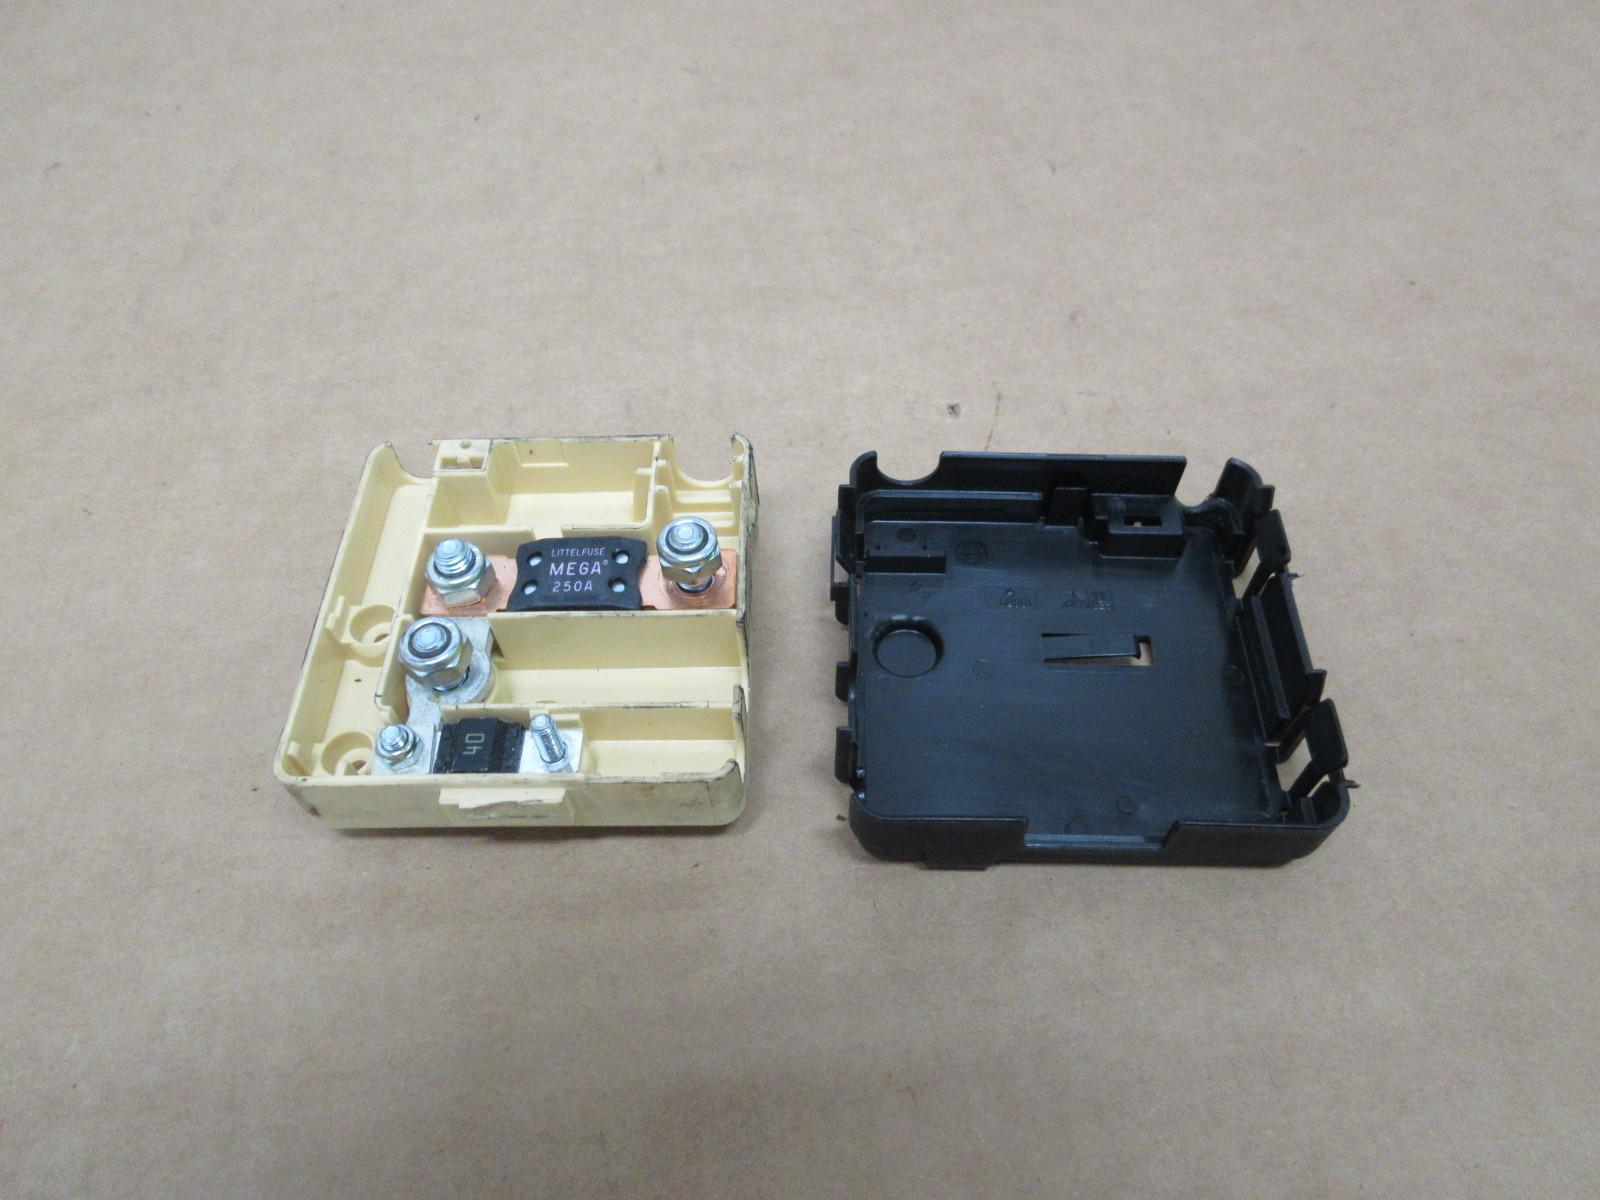 2006 Bmw Z4 M Roadster E85 1023 Trunk Battery Fuse Box Terminal 61136924389 Pk Auto Parts Inc